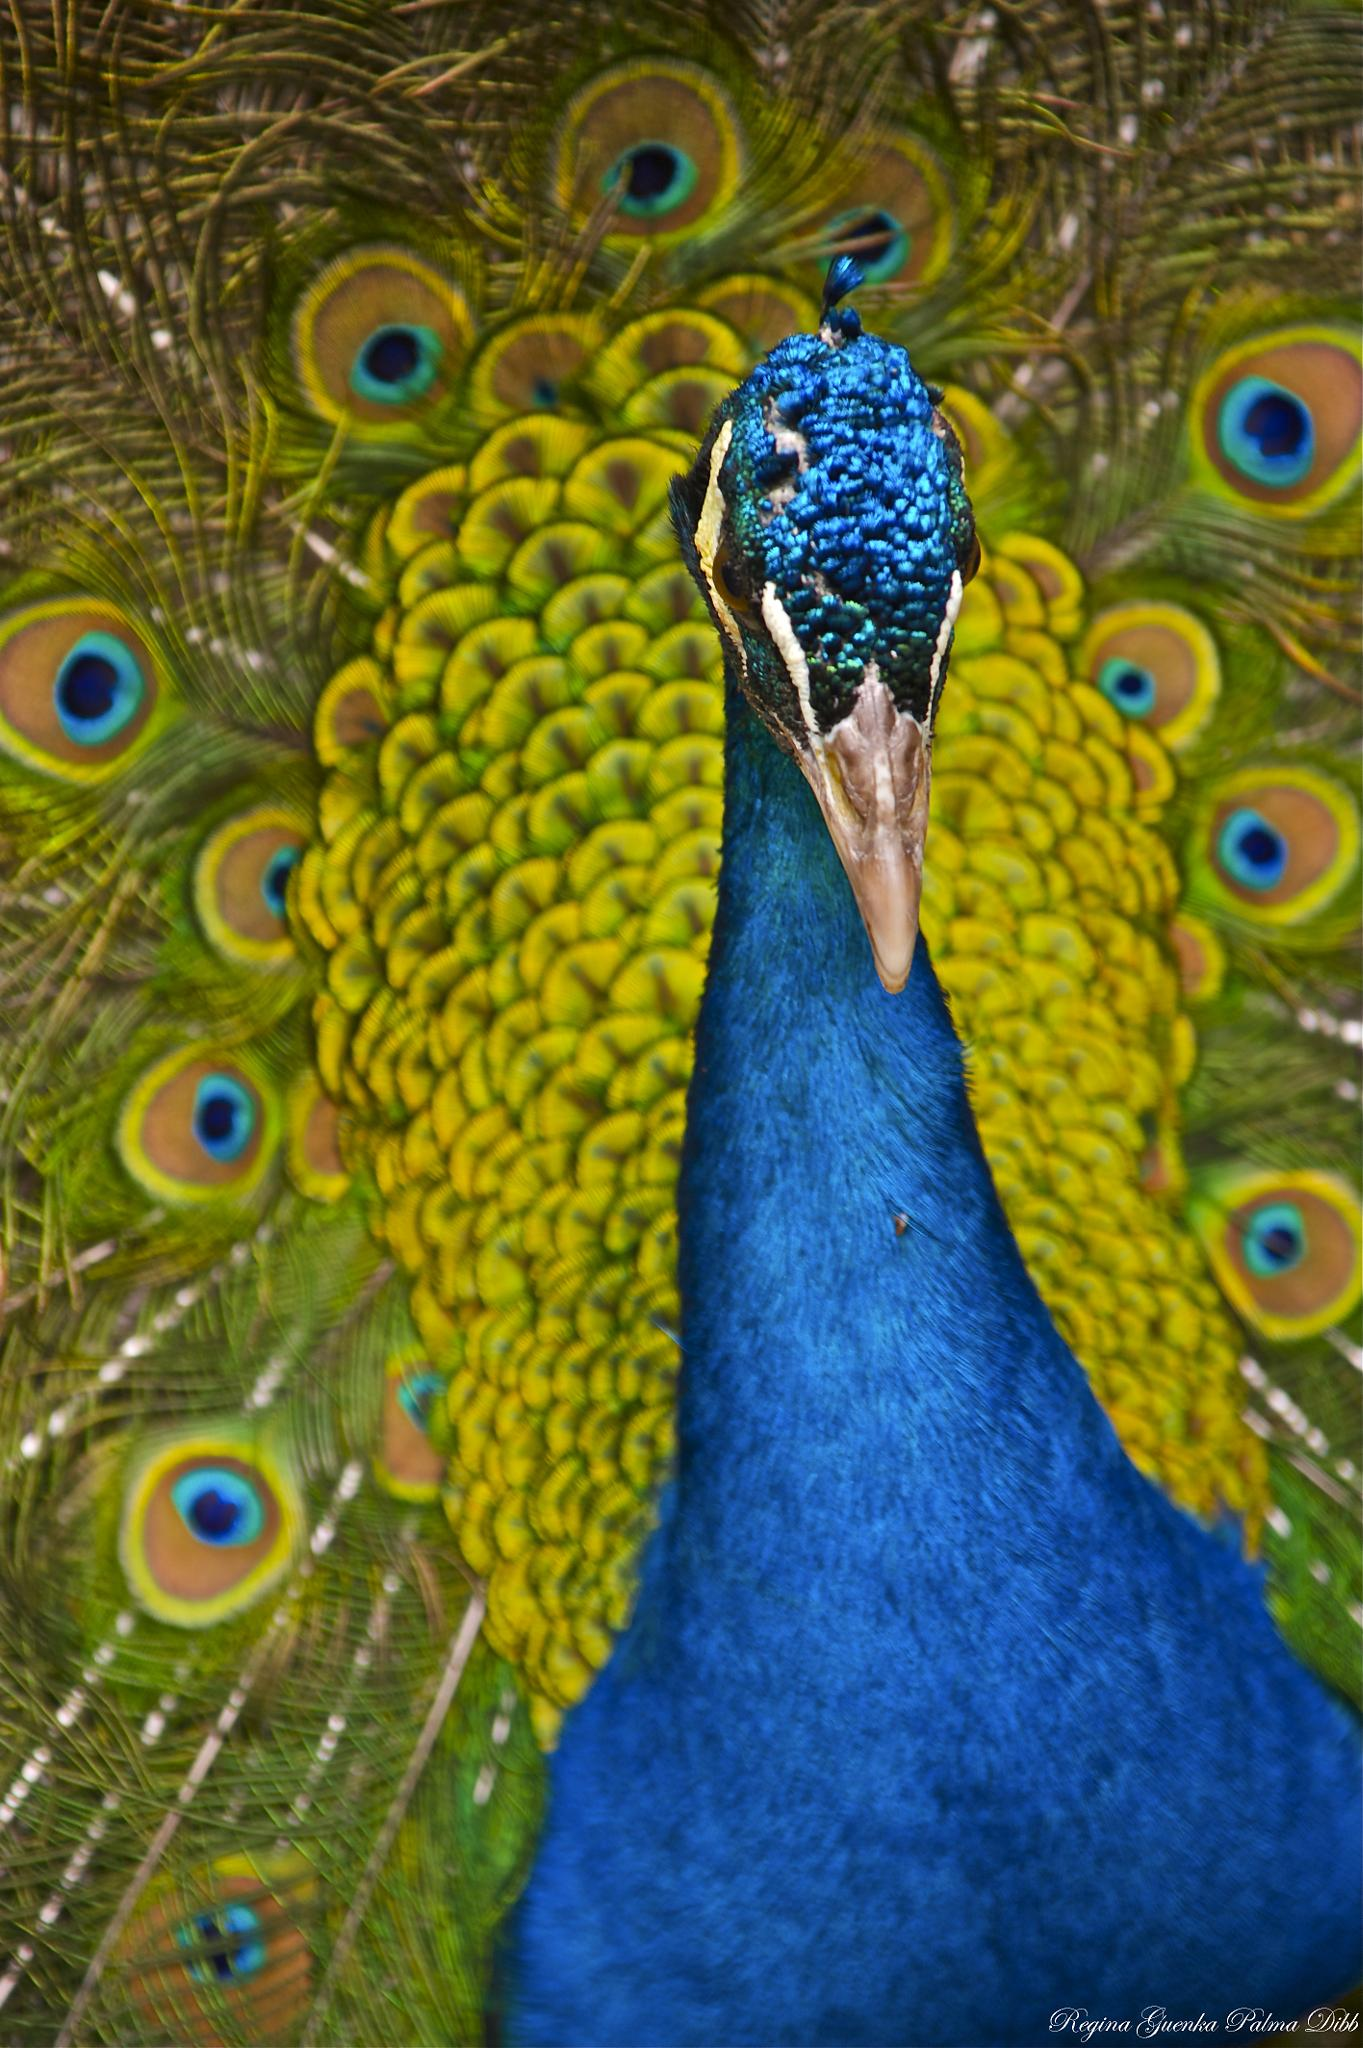 Peacok by Regina Guenka Palma-Dibb